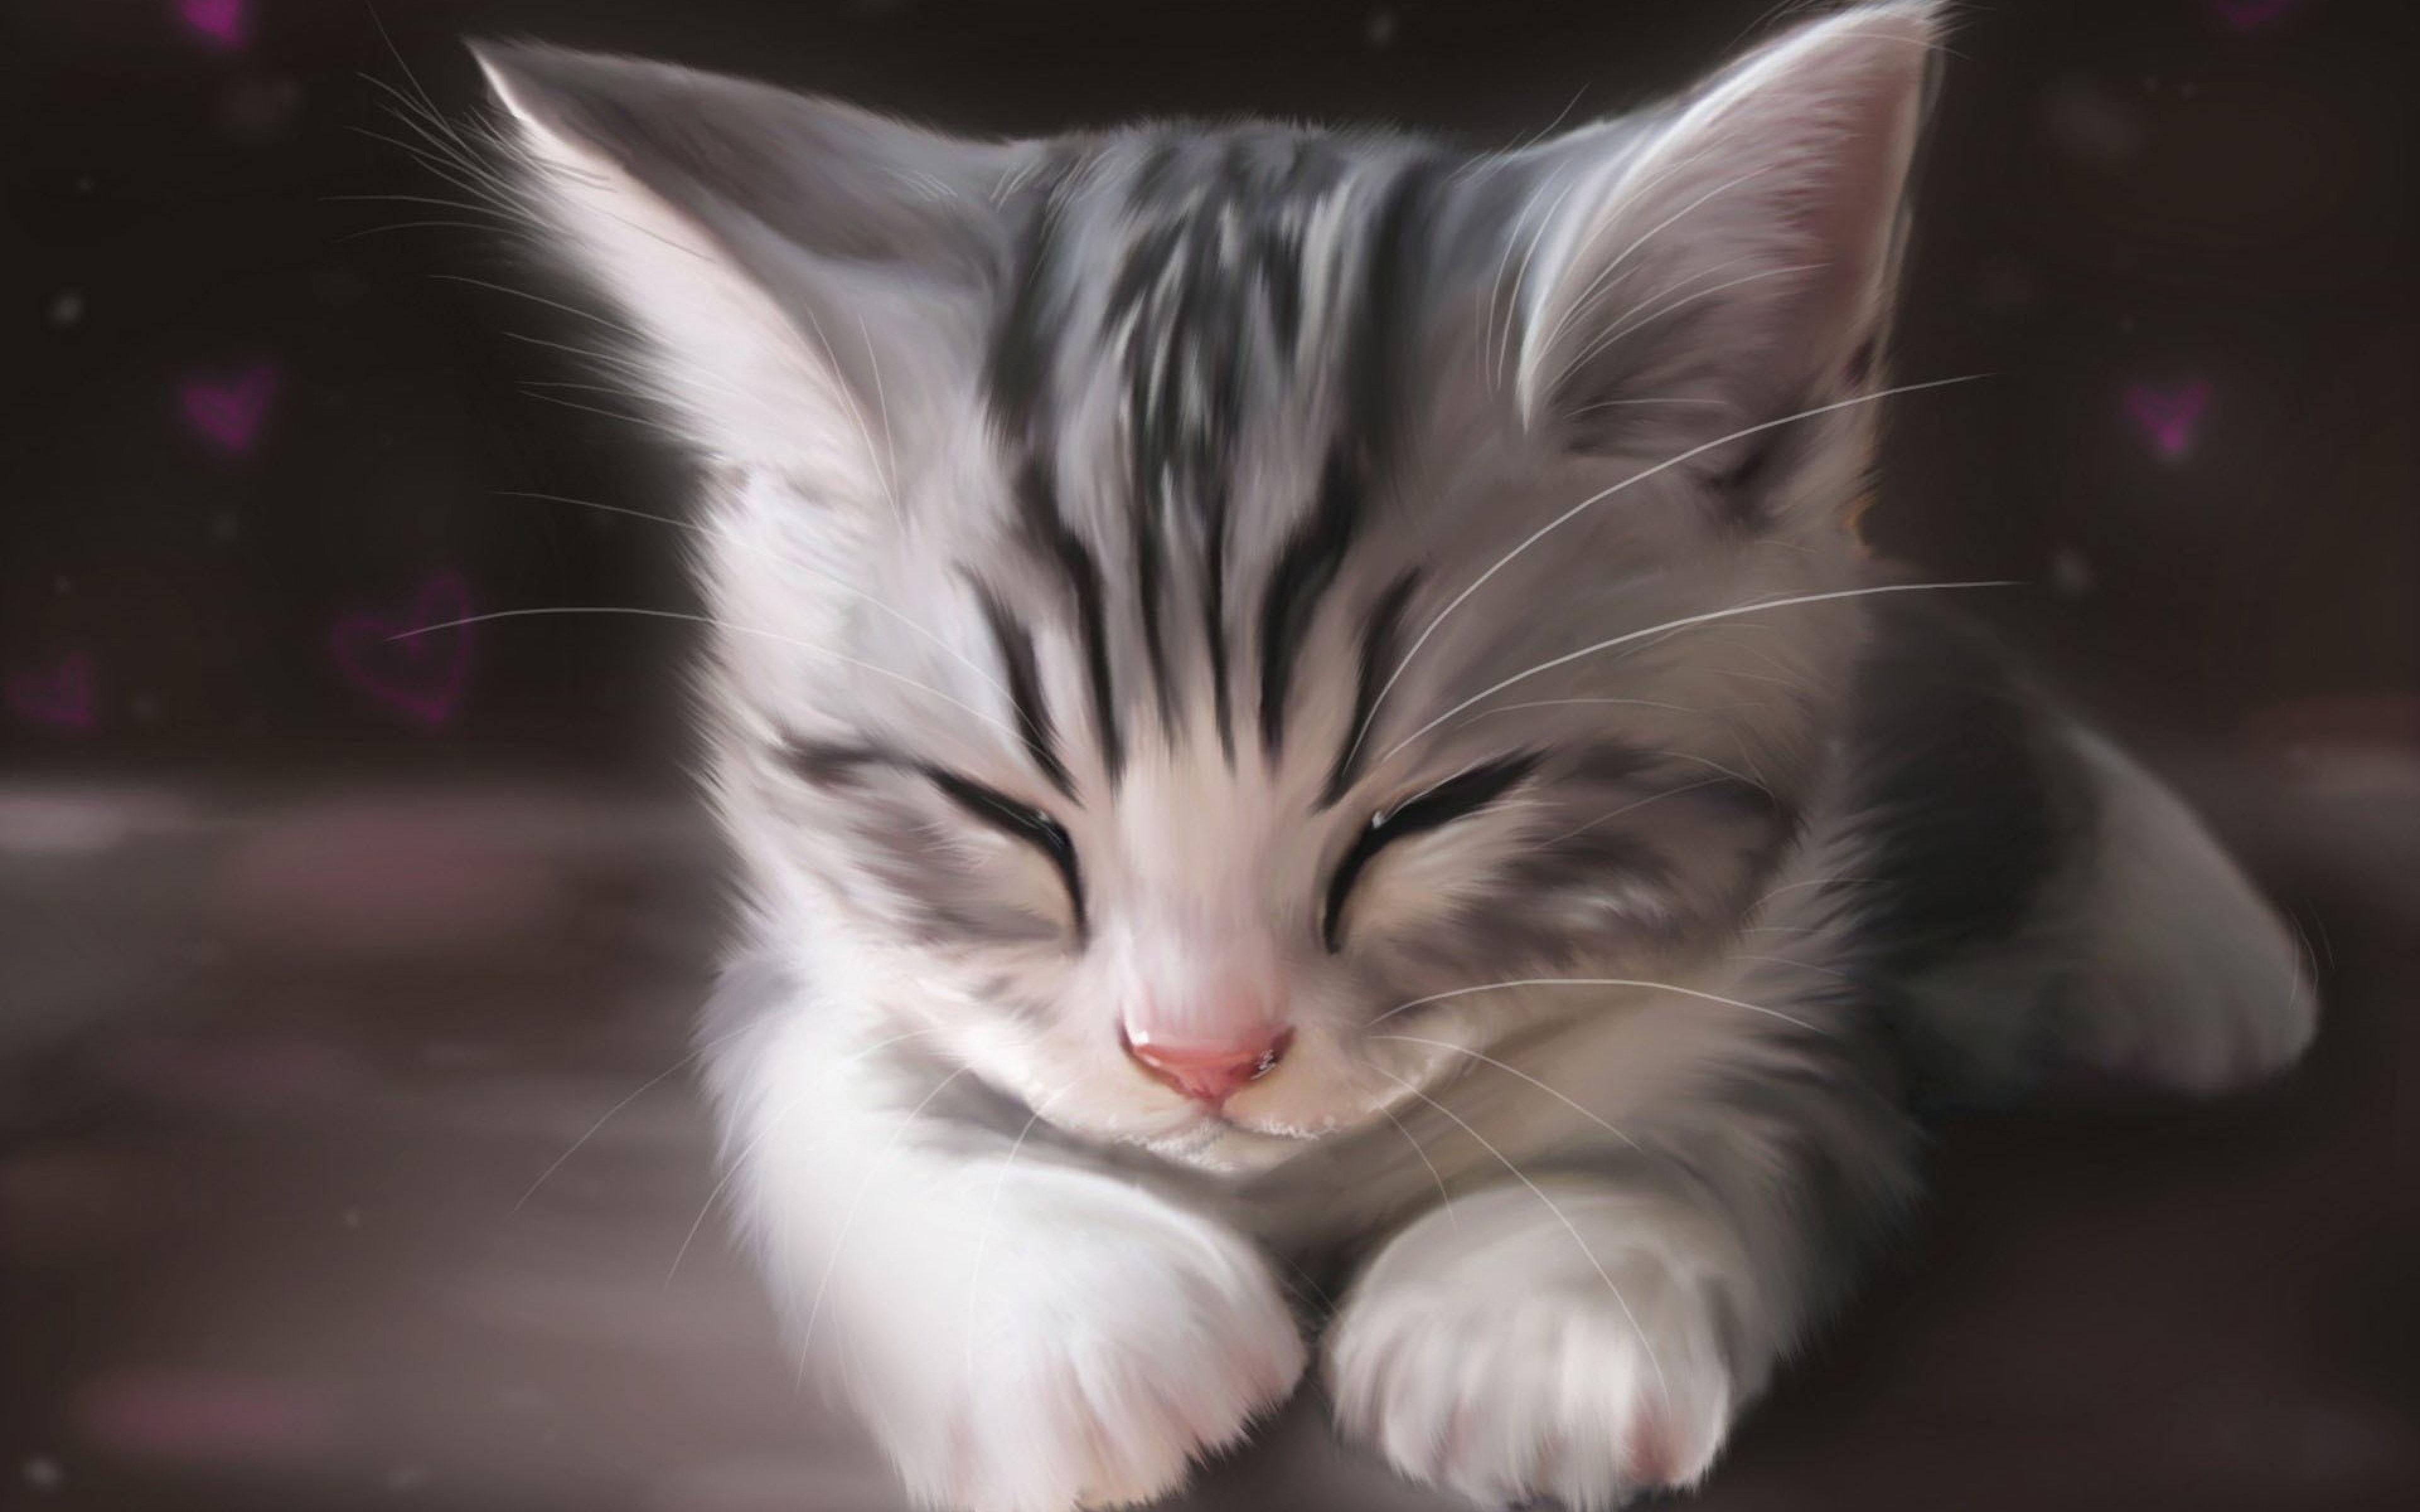 Gray Cat Eyes 4k Ultra Hd Wallpaper Cats Grey Cats Pets Cats